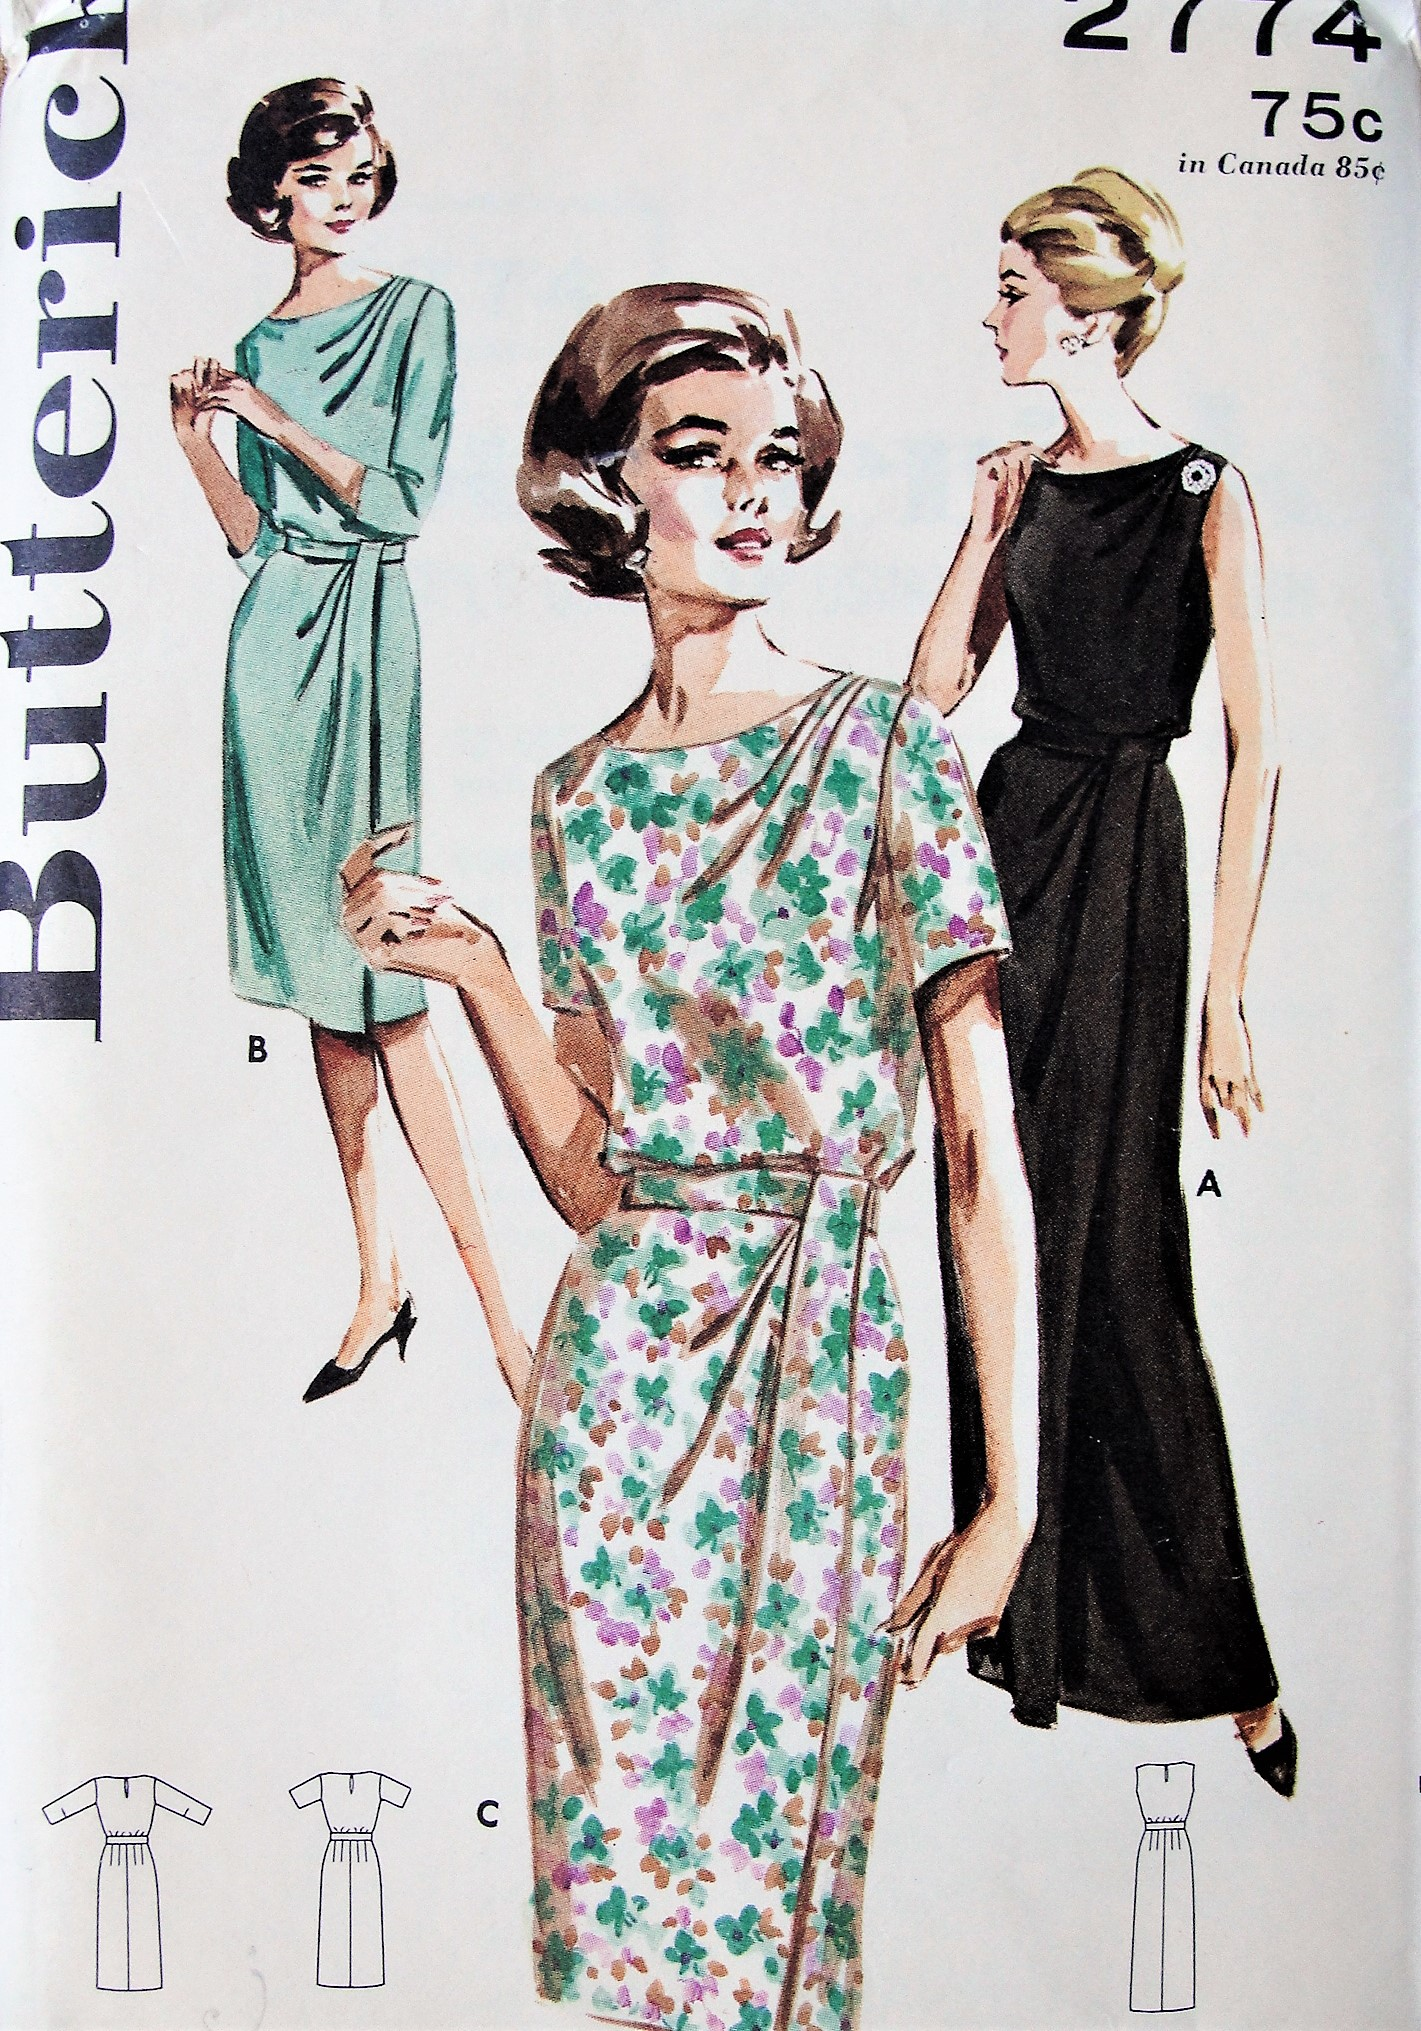 1960s Elegant Cocktail Dress Evening Gown Pattern Butterick 2774 Loveluy Draped Left Shoulder Draped Skirt Stunning Design Bust 34 Vintage Sewing Pattern Factory Folded